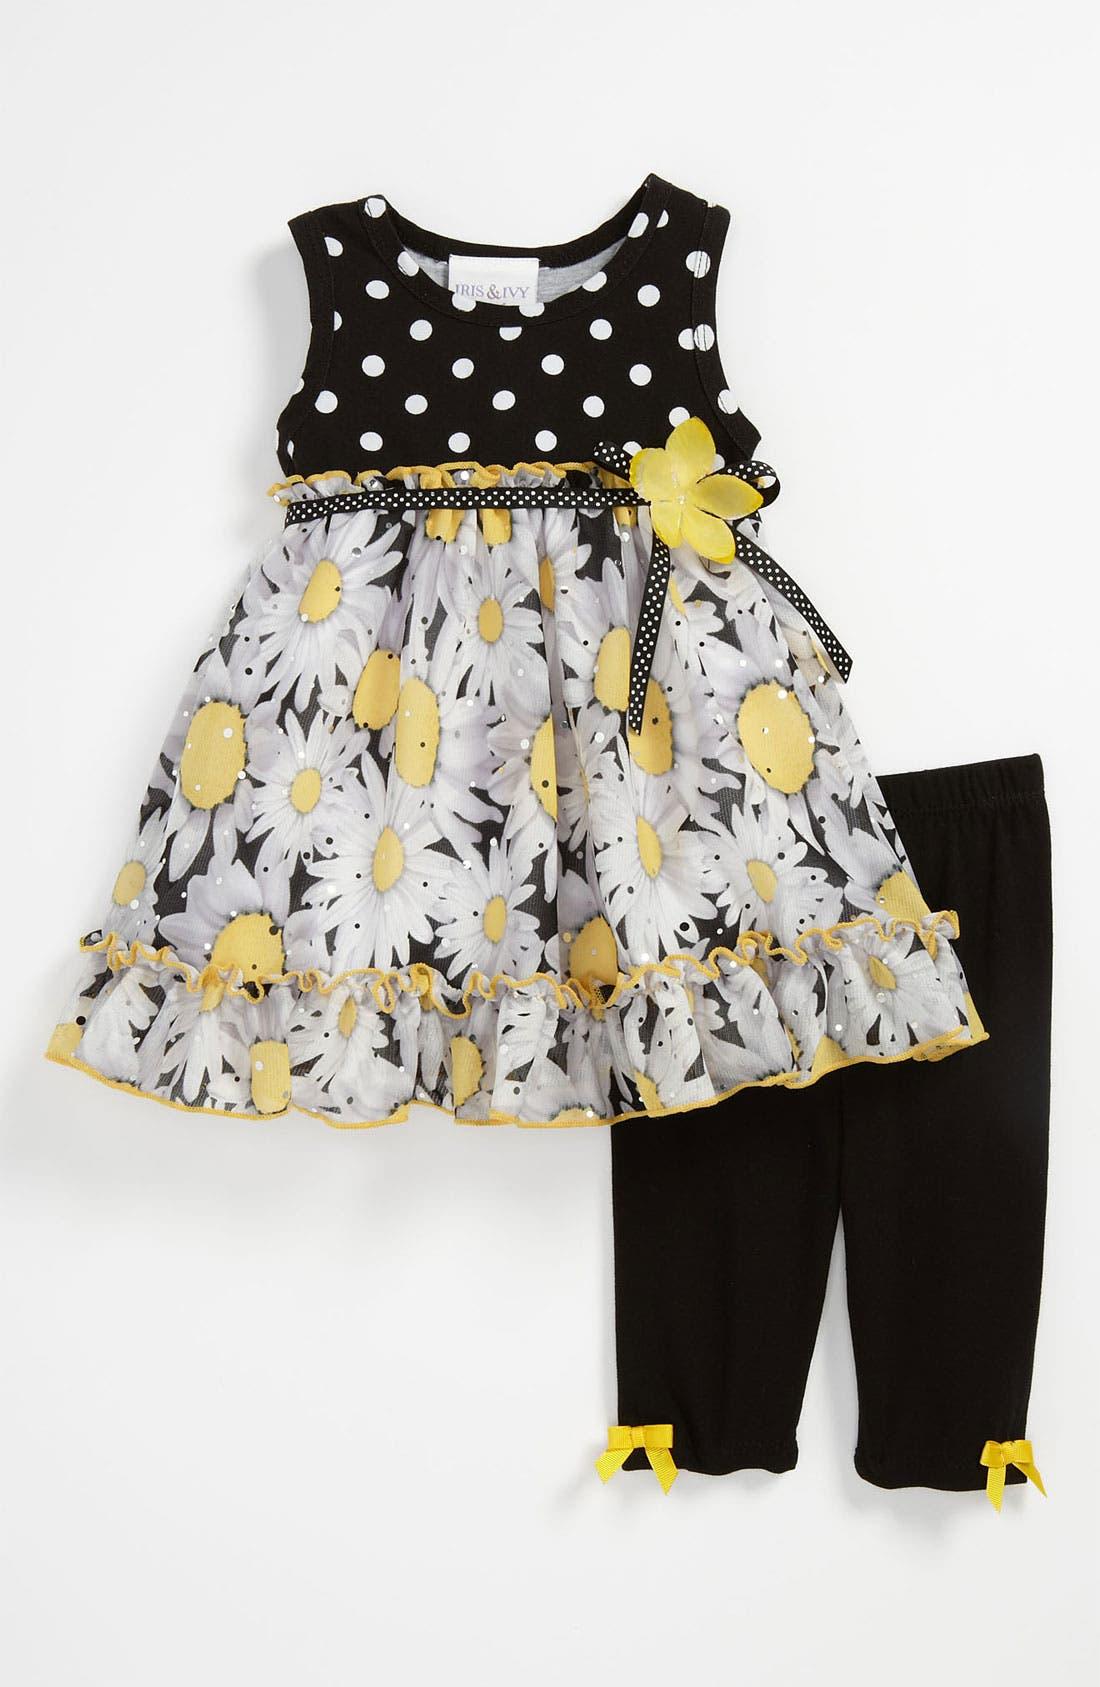 Main Image - Iris & Ivy 'Daisy' Dress & Leggings (Baby)